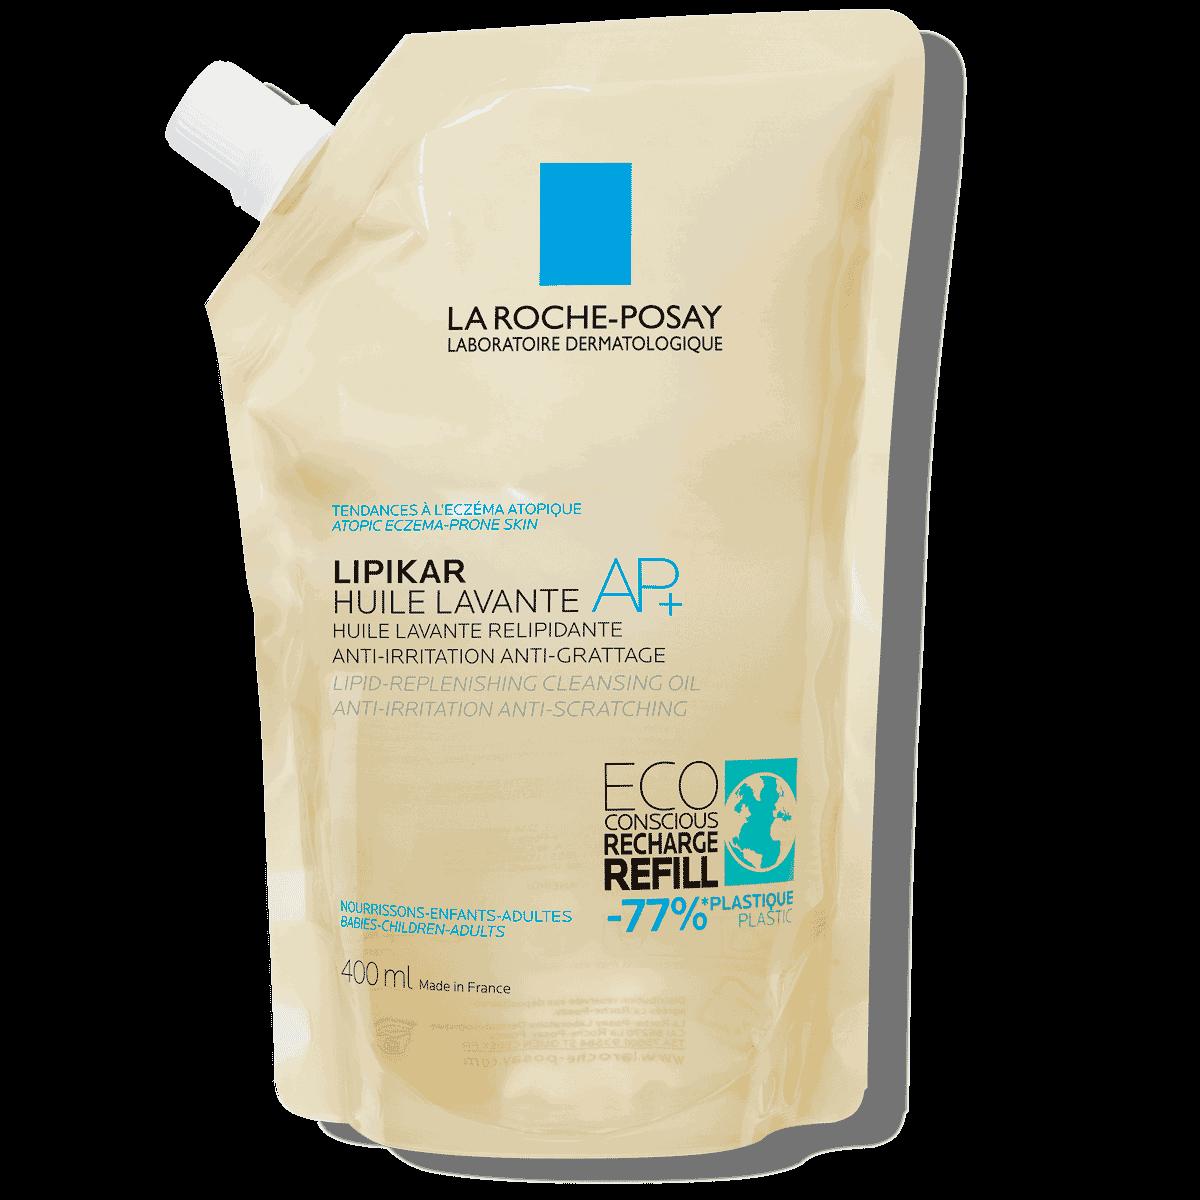 Lipikar Eco conscious Refill Cleansing Oil AP 400 ml | La Roche Posay